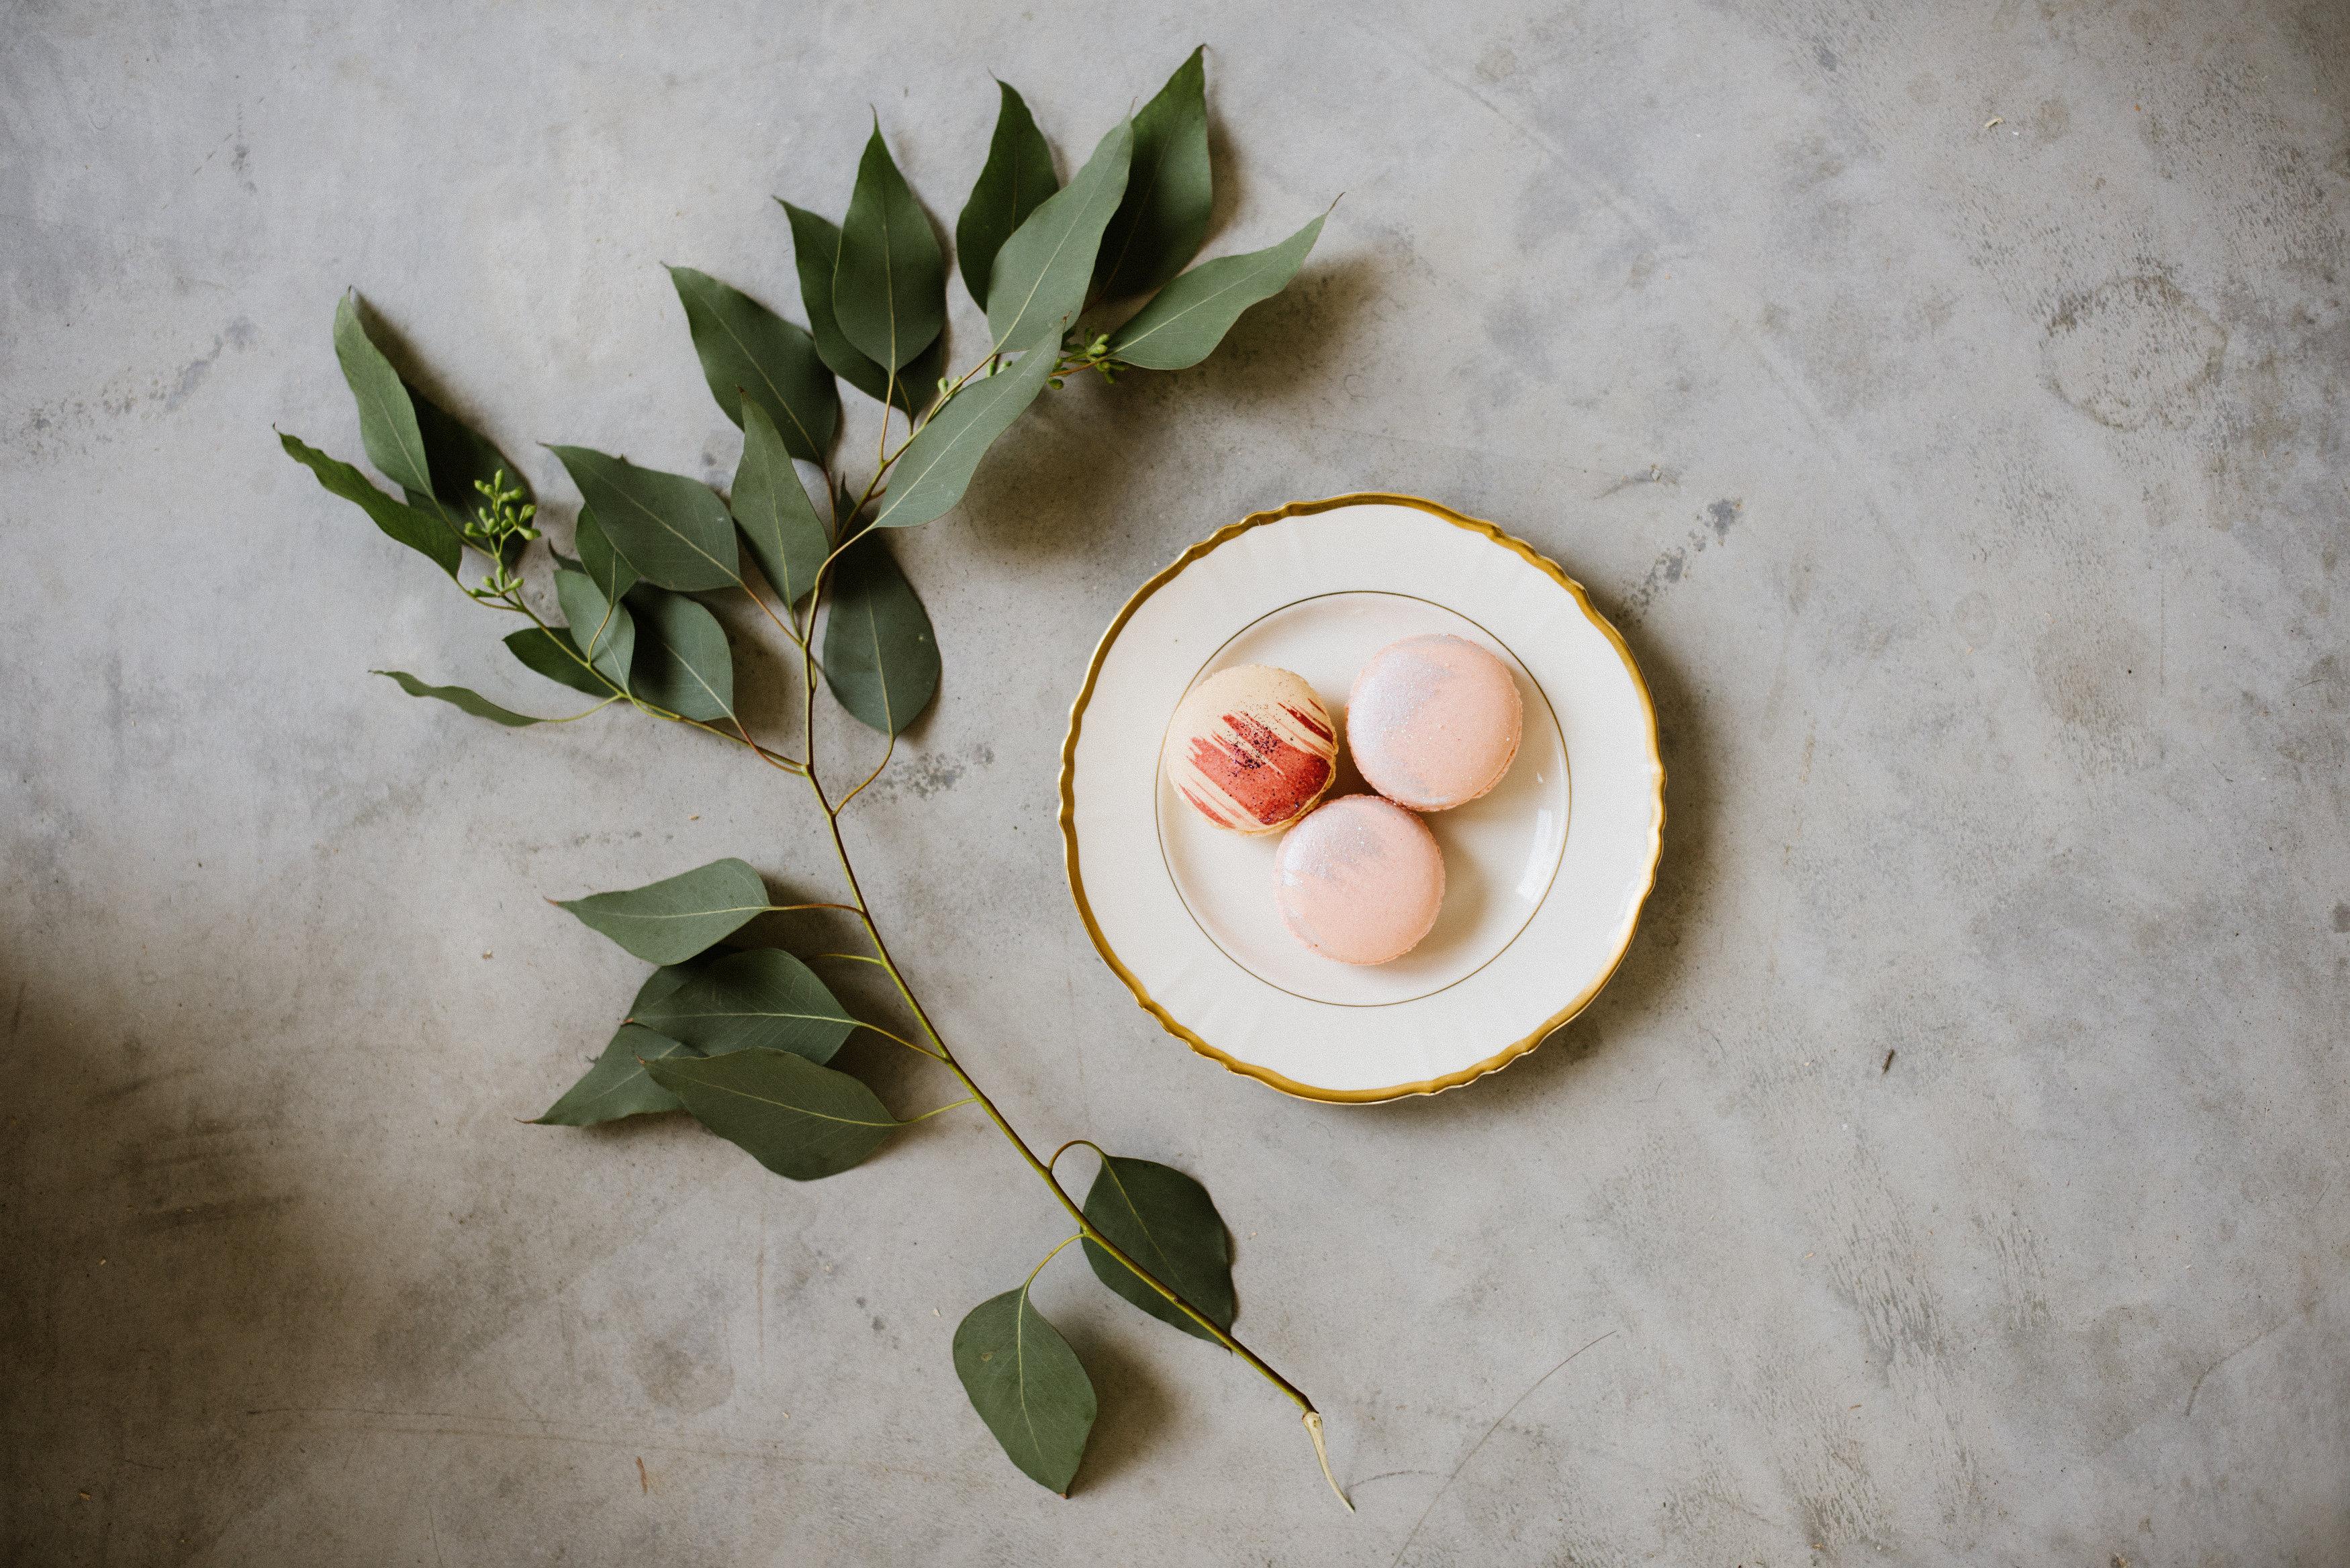 White & Ivory Dessert Plate